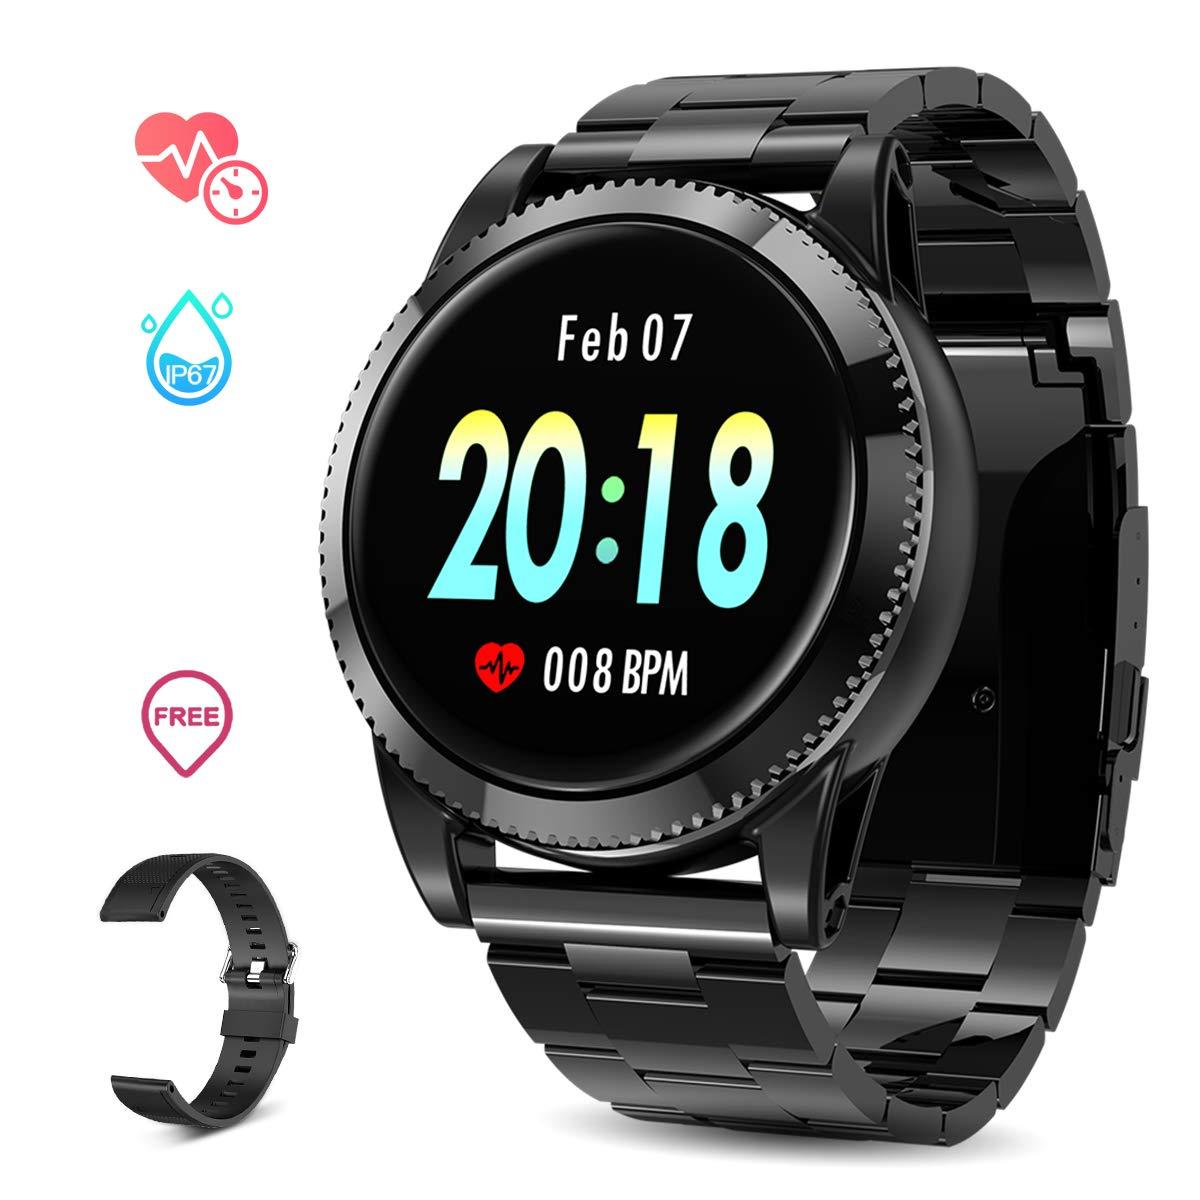 832ebec36fd2 Amazon.com  Smart Watch for Men